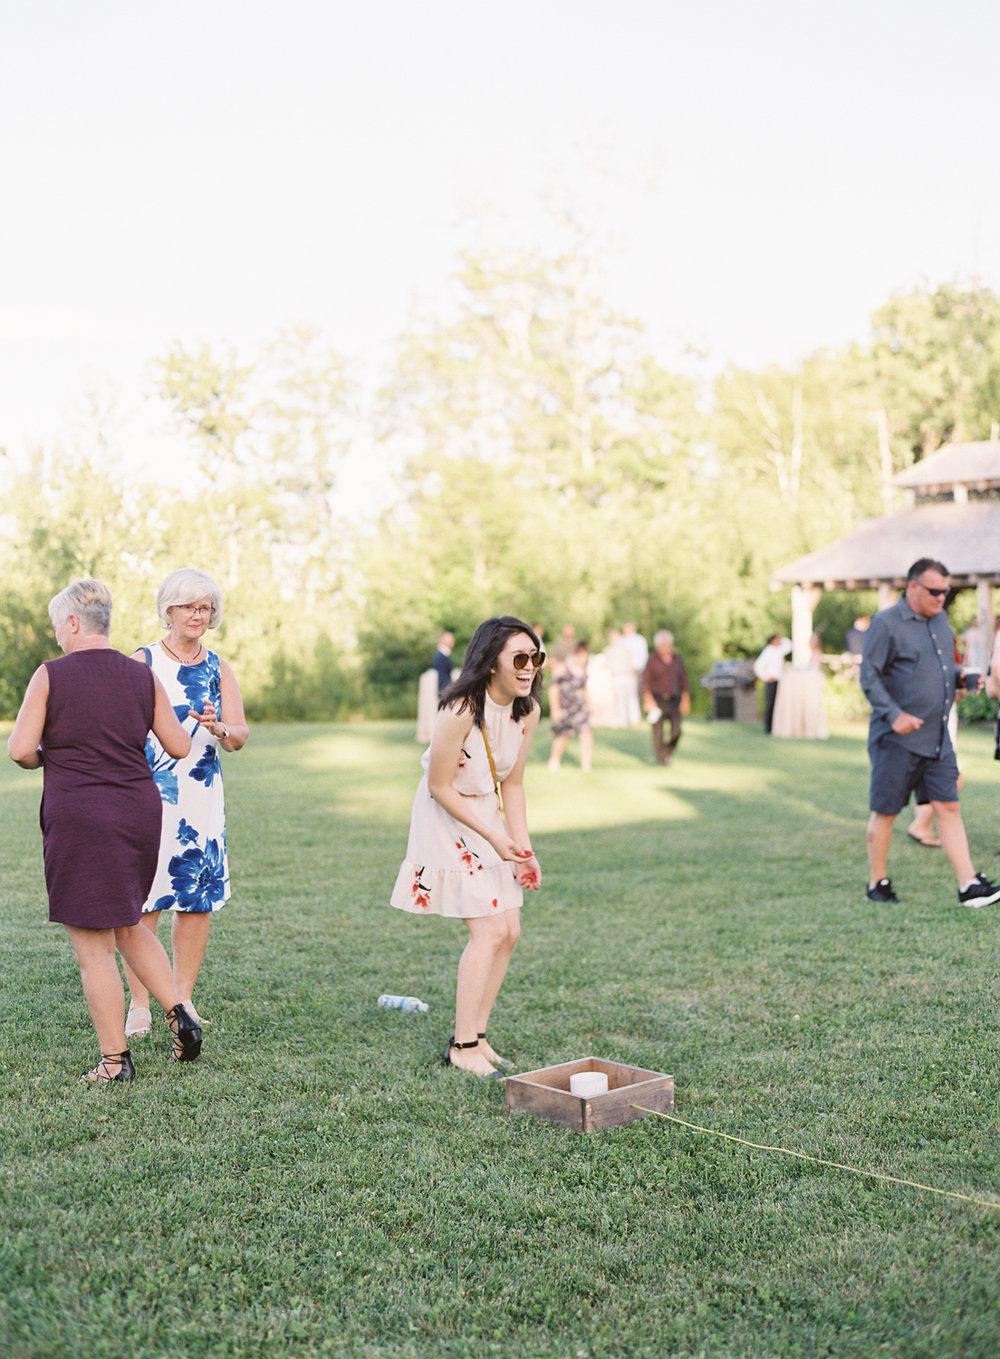 Jacqueline Anne Photography - Nova Scotia Backyard Wedding-60.jpg